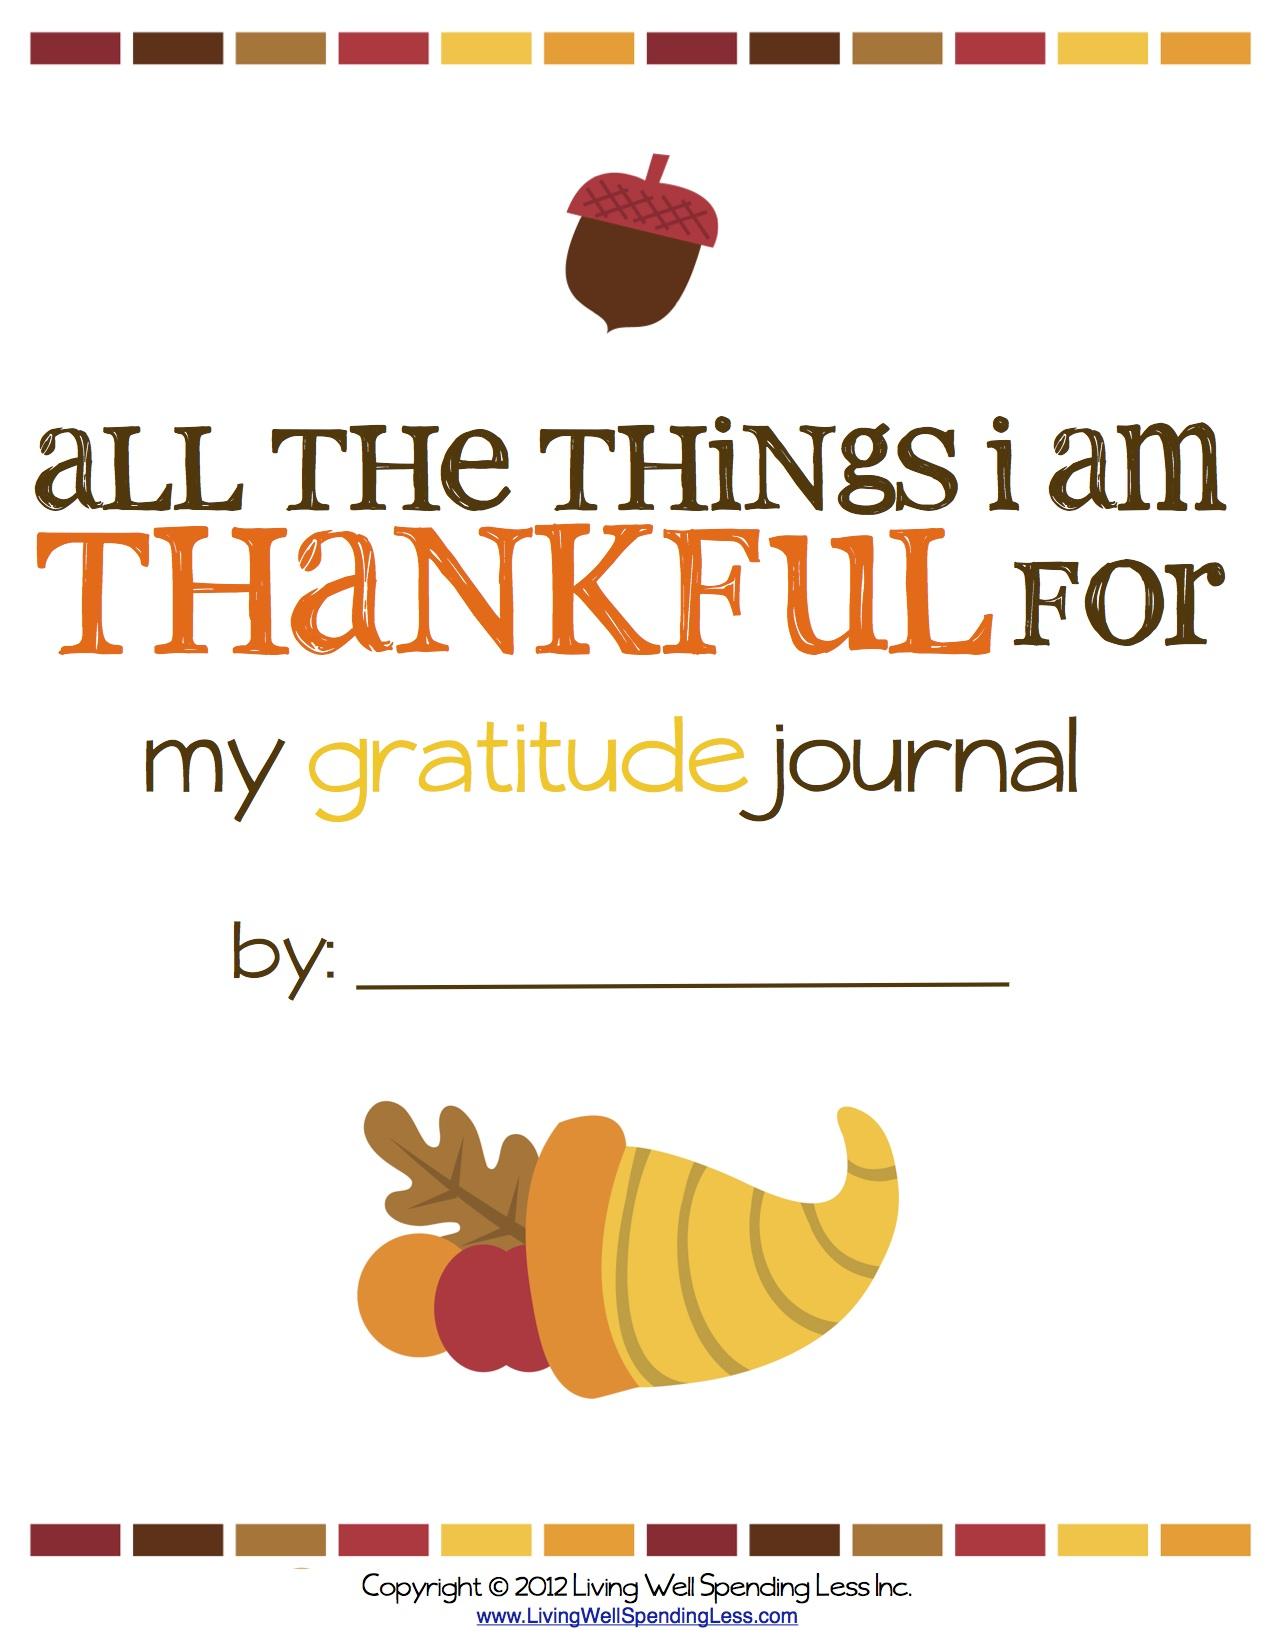 FREE Printable Gratitude Journal | Gratitude Journal Printable | Free Gratitude Journal PDF